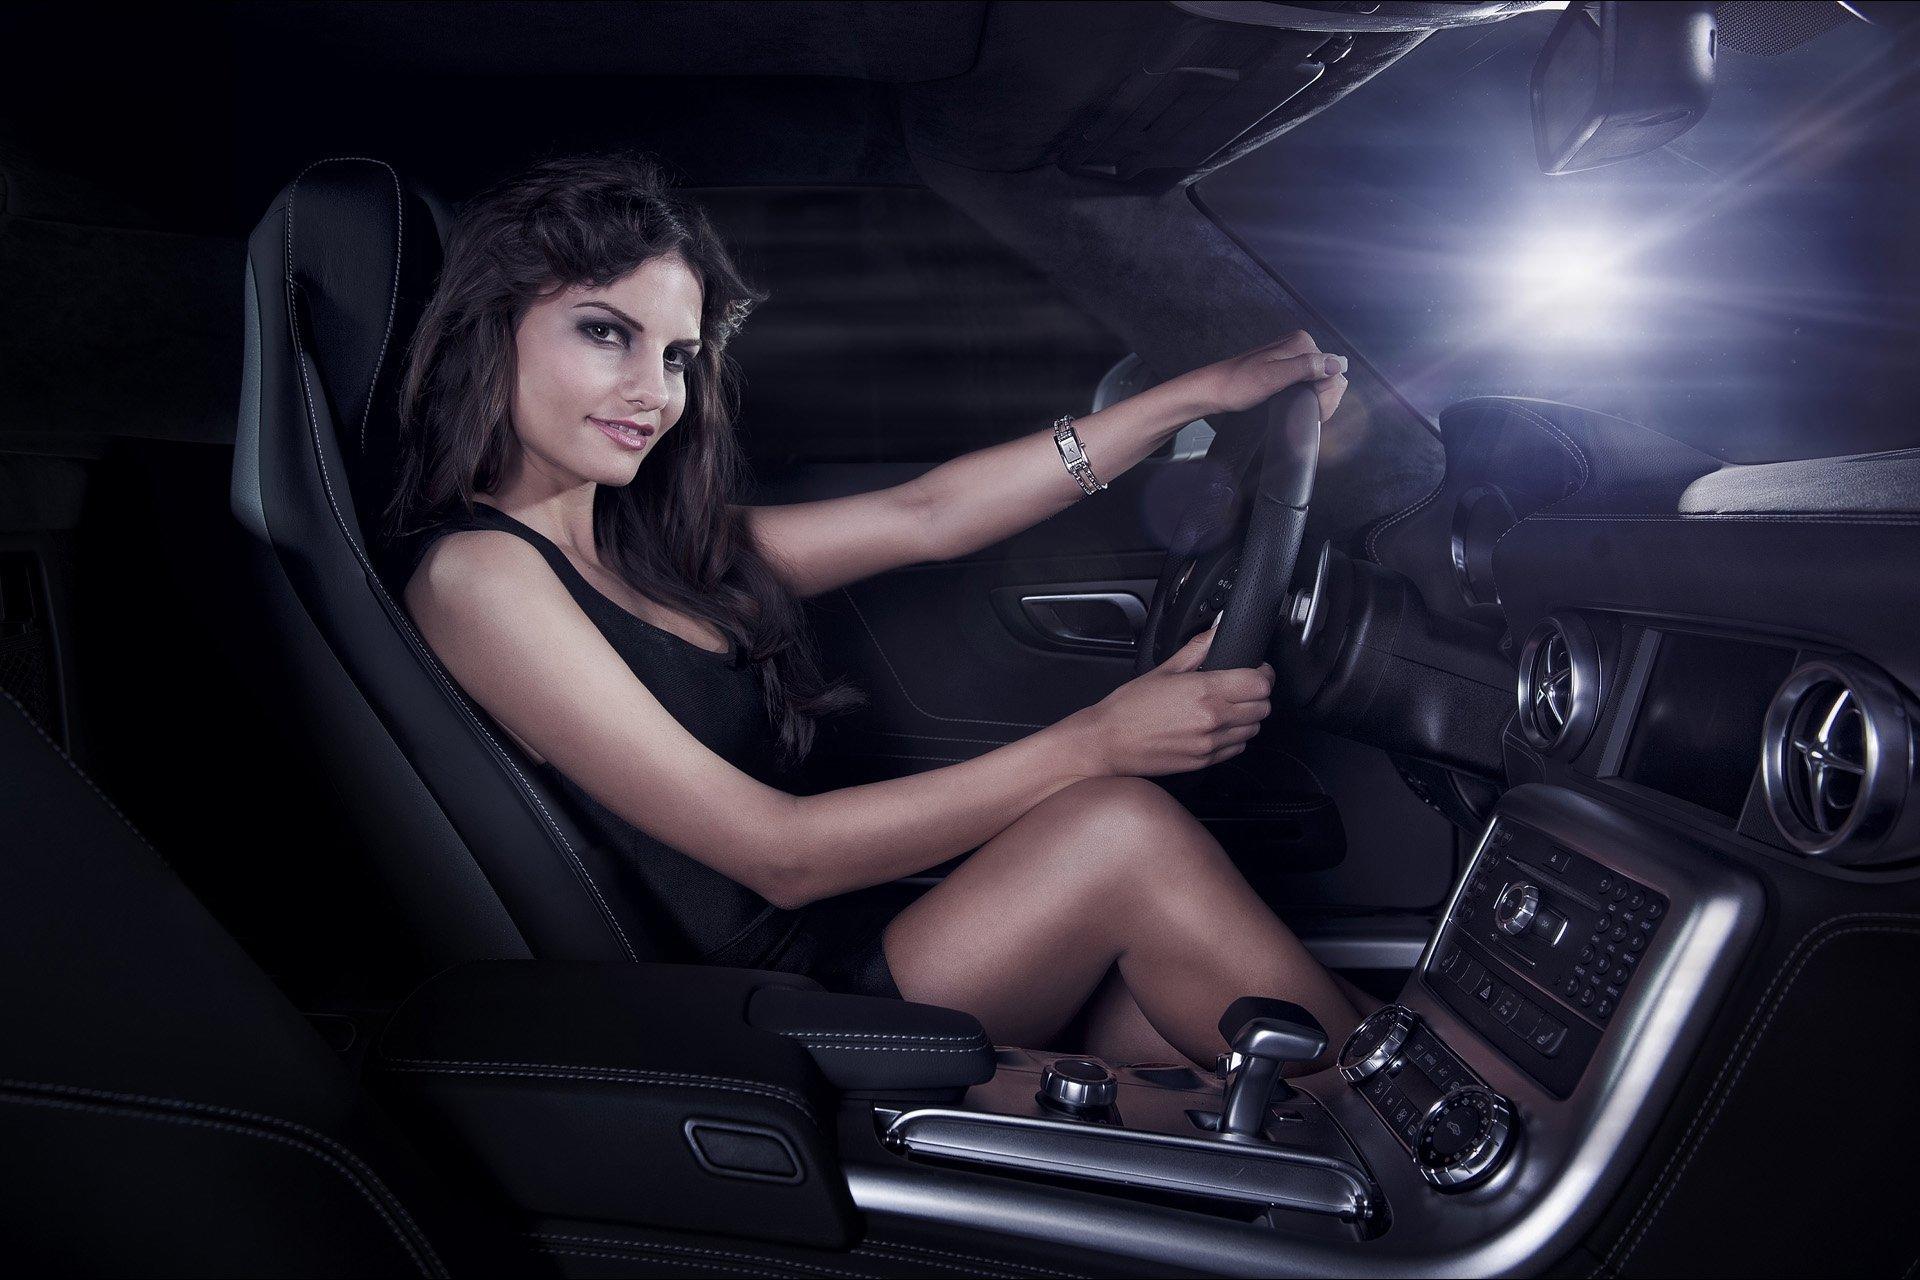 фото в машине девушки - 4